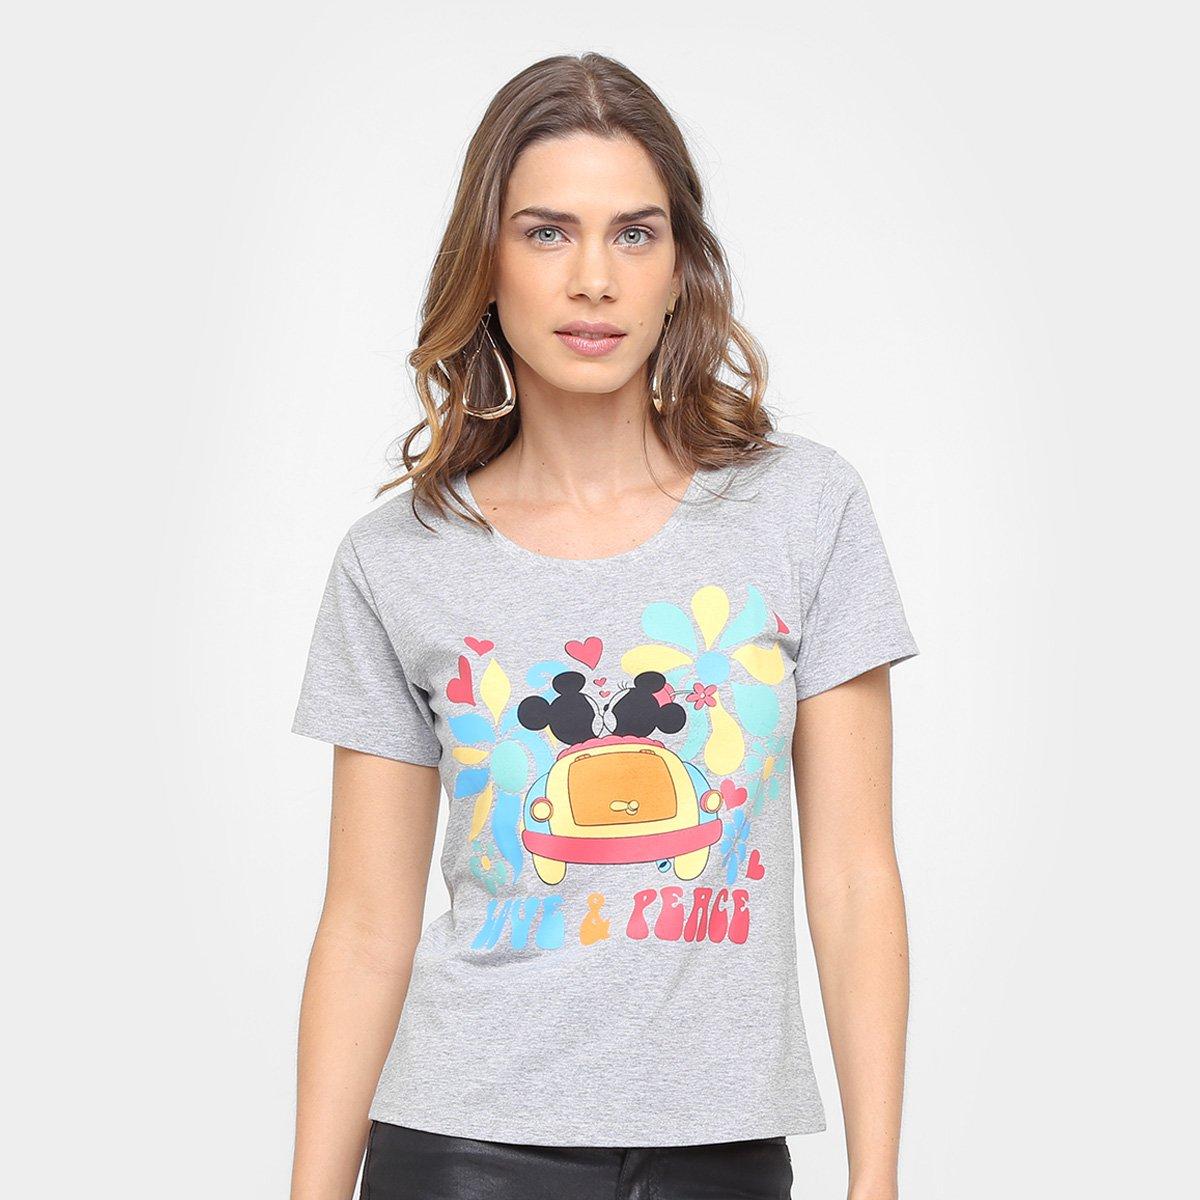 a09069e43 Camiseta Disney Mickey e Minnie Love   Peace Feminina - Compre Agora ...